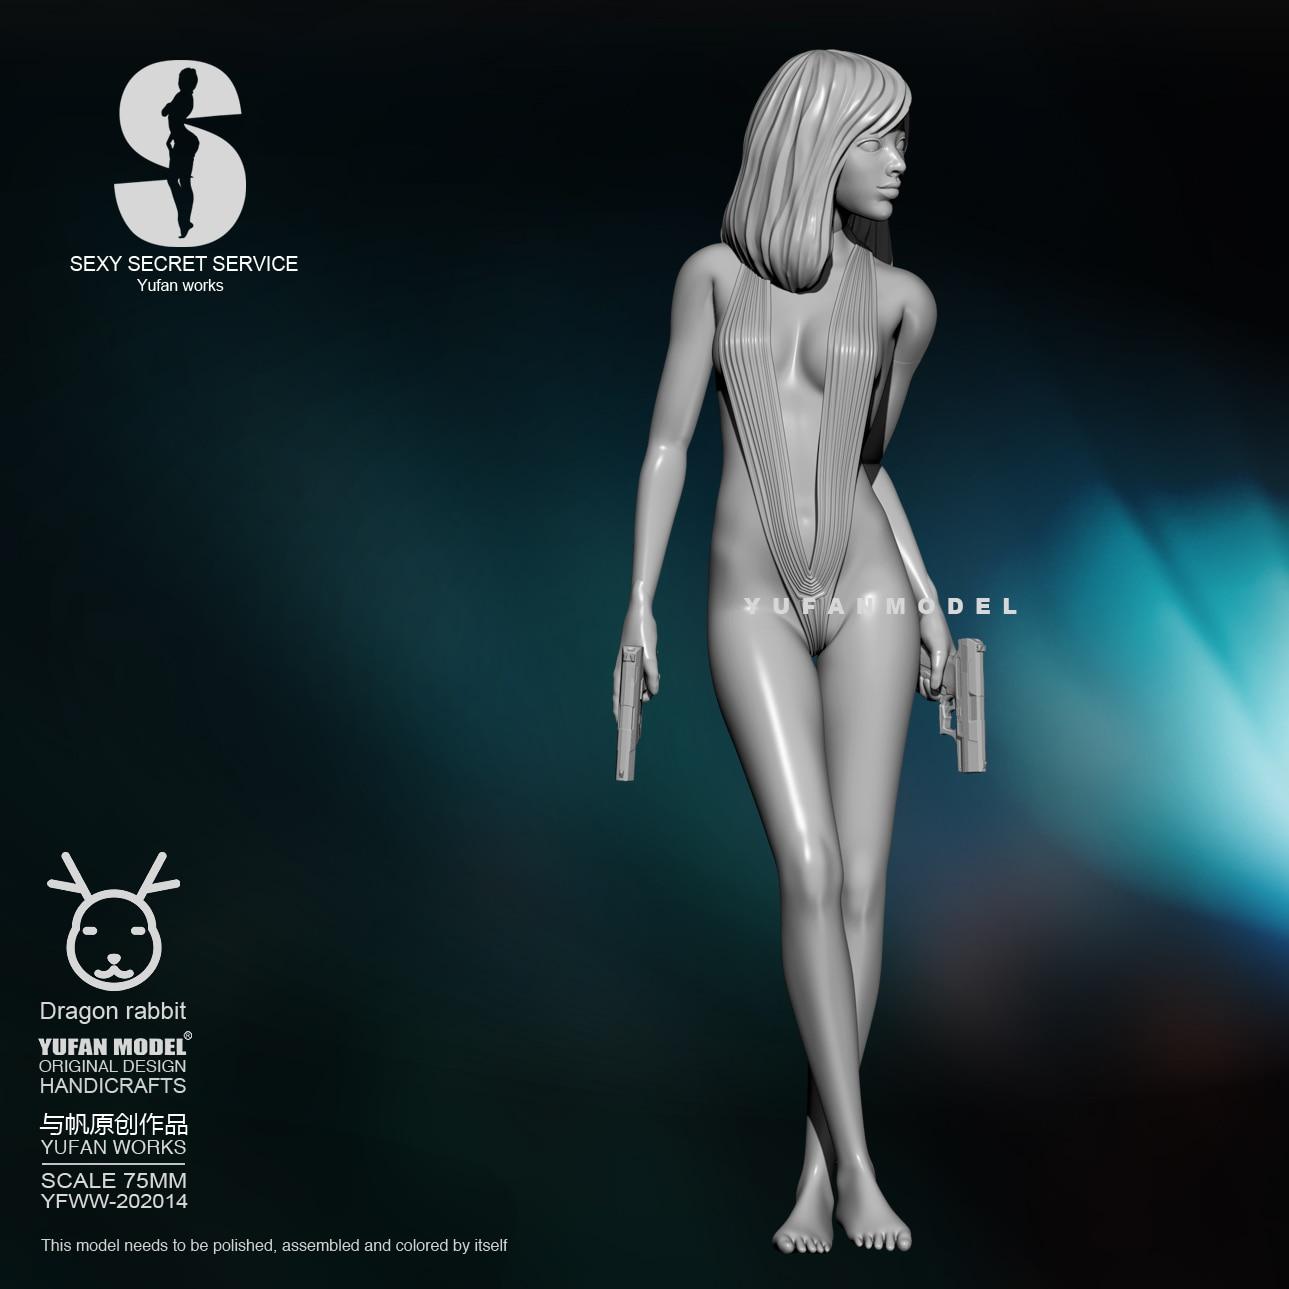 75MM Resin Kits  Yufan Model Sexy Agent  Self-assembled YFWW-201908